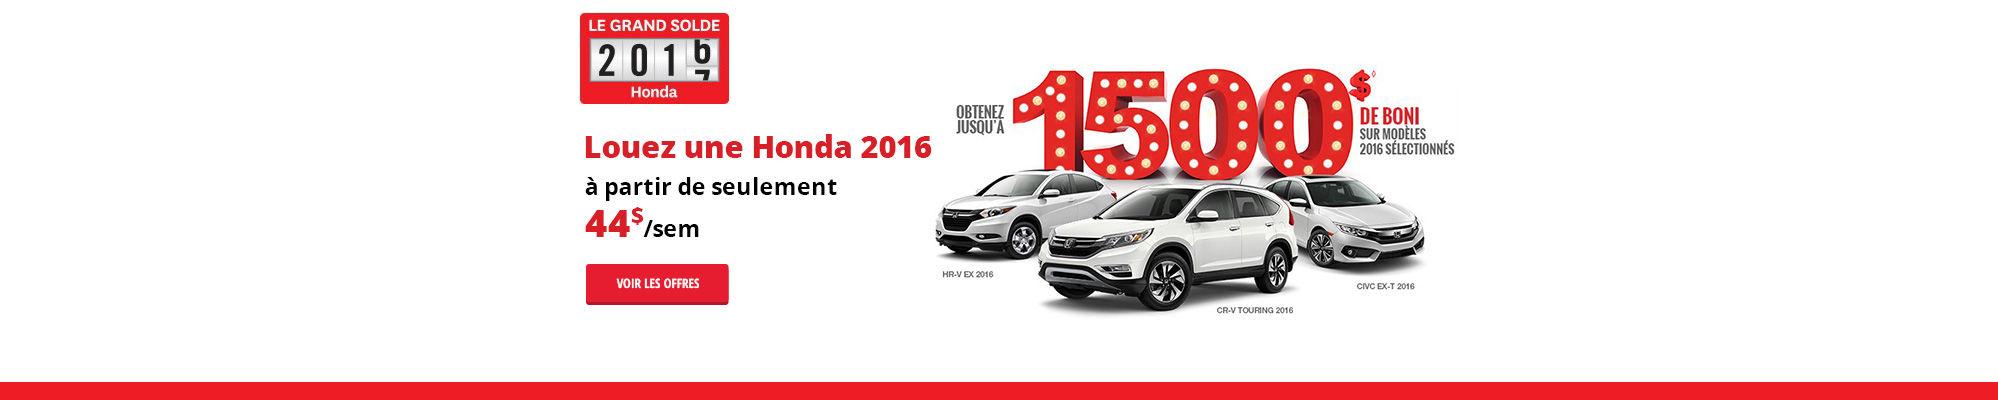 La grande liquidation de Honda